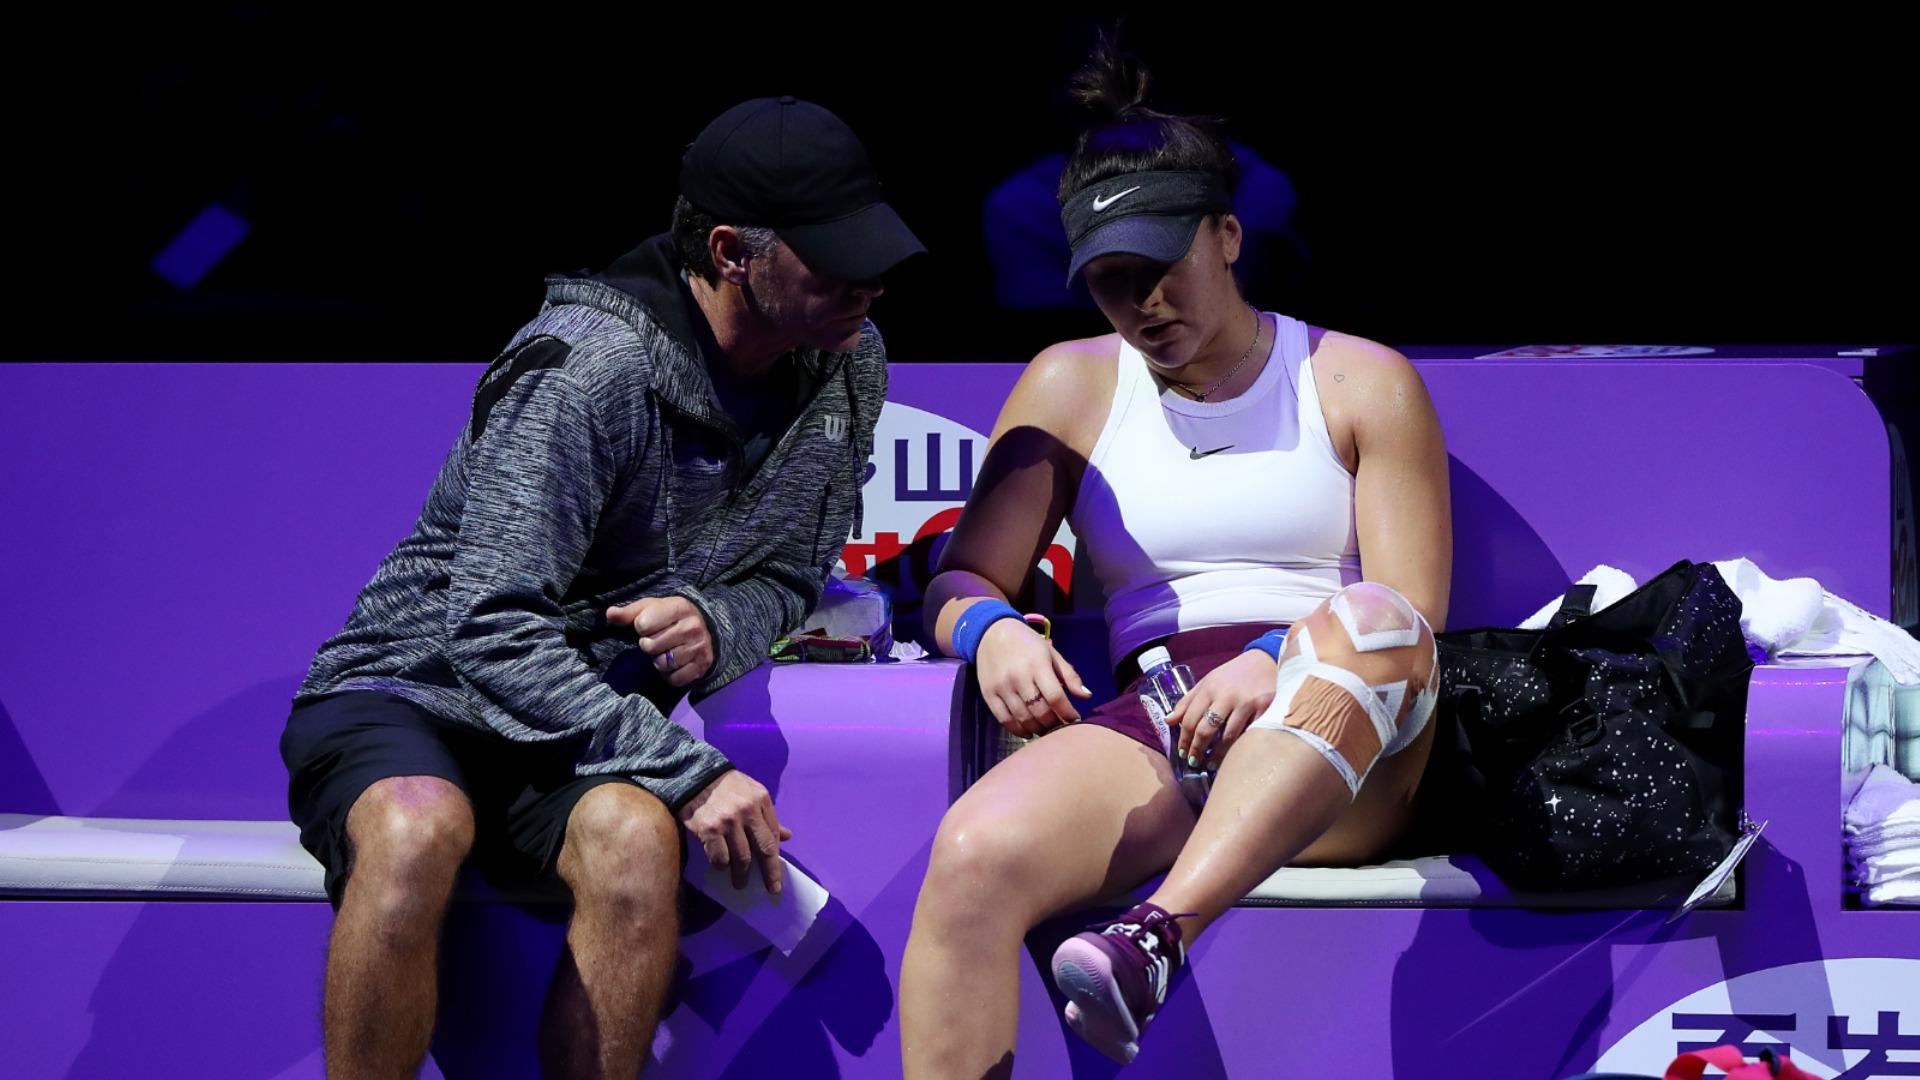 Andreescu retires to exit WTA Finals, defending champion Svitolina reaches semis